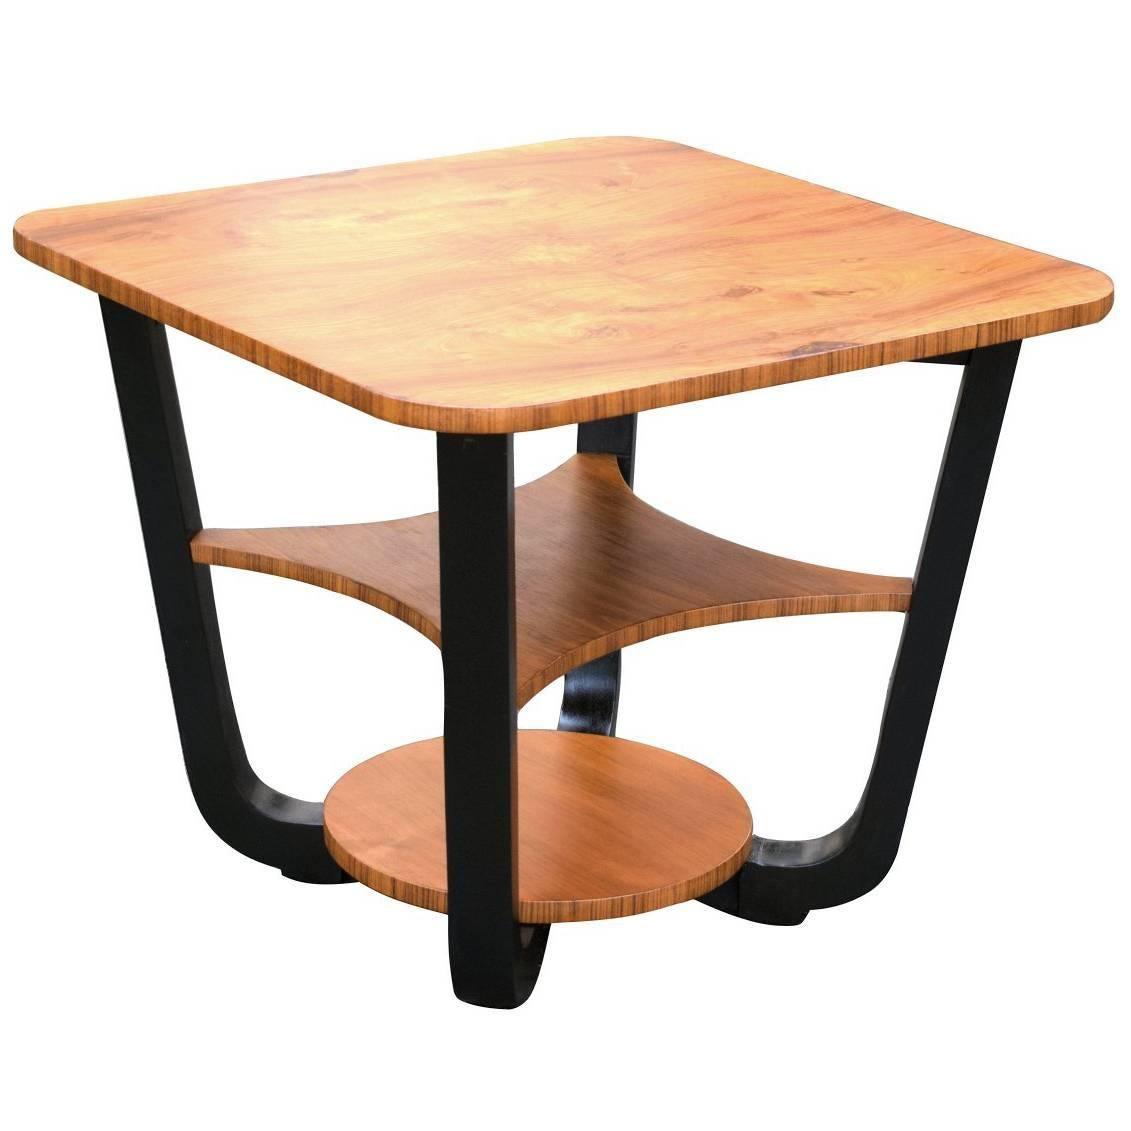 English Art Deco Occasional Table in Figured Walnut, circa 1930